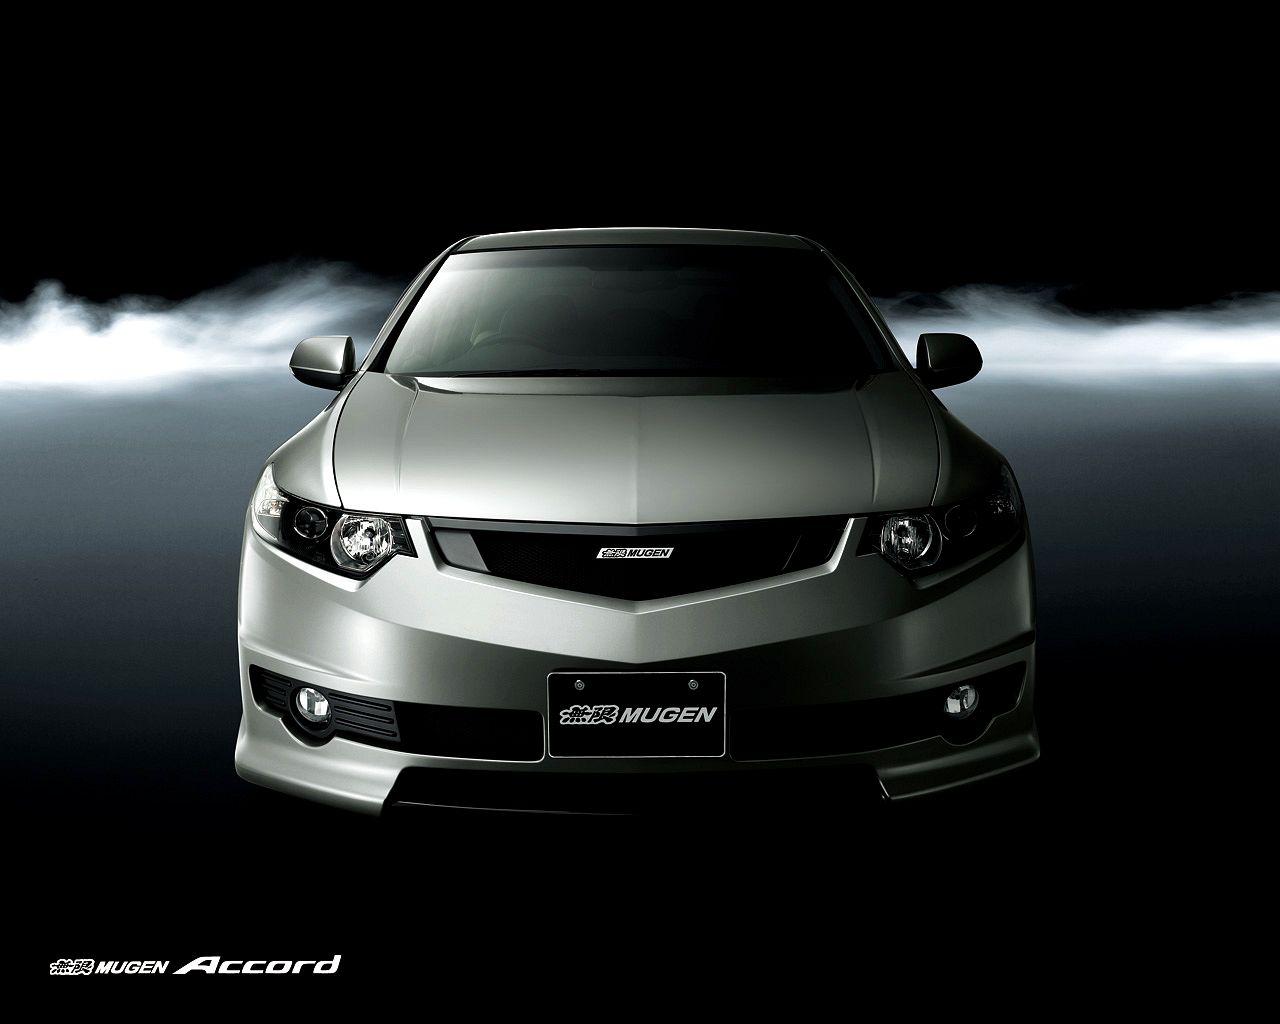 Honda Mugen Accord Wallpaper 1280x1024